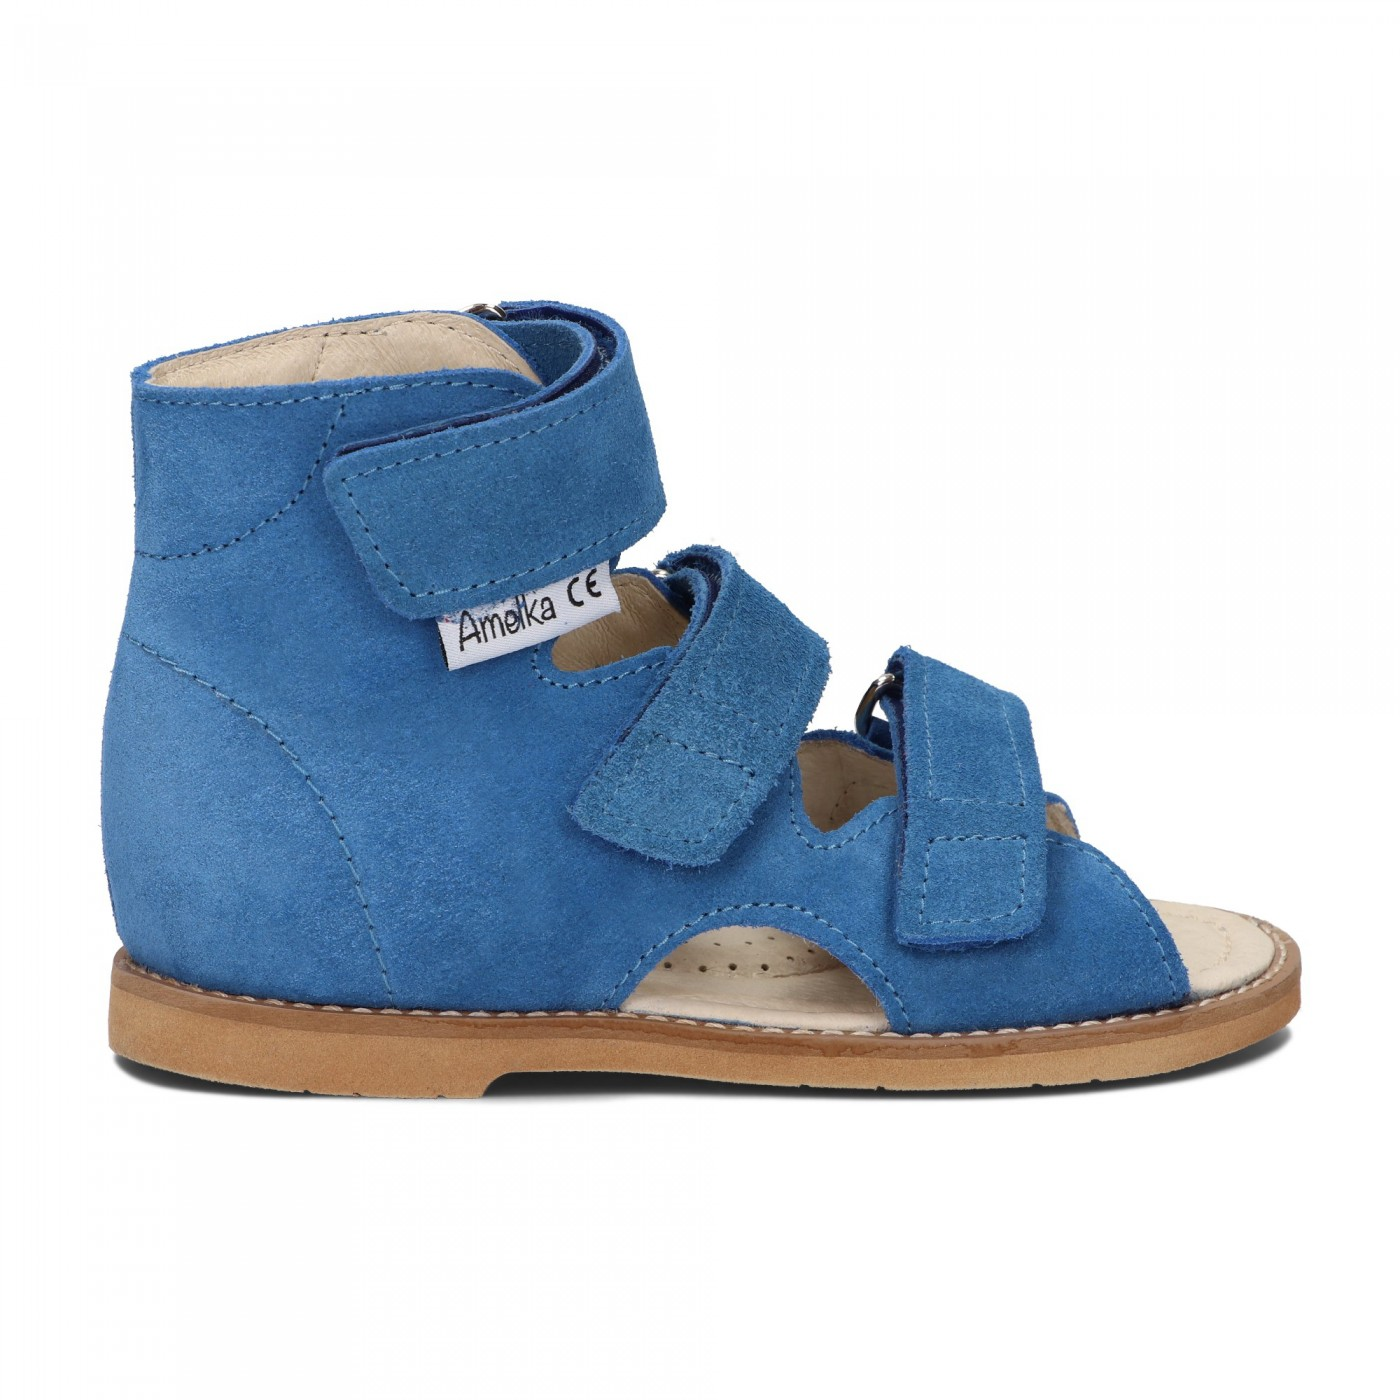 Amelka 1010 Niebieski